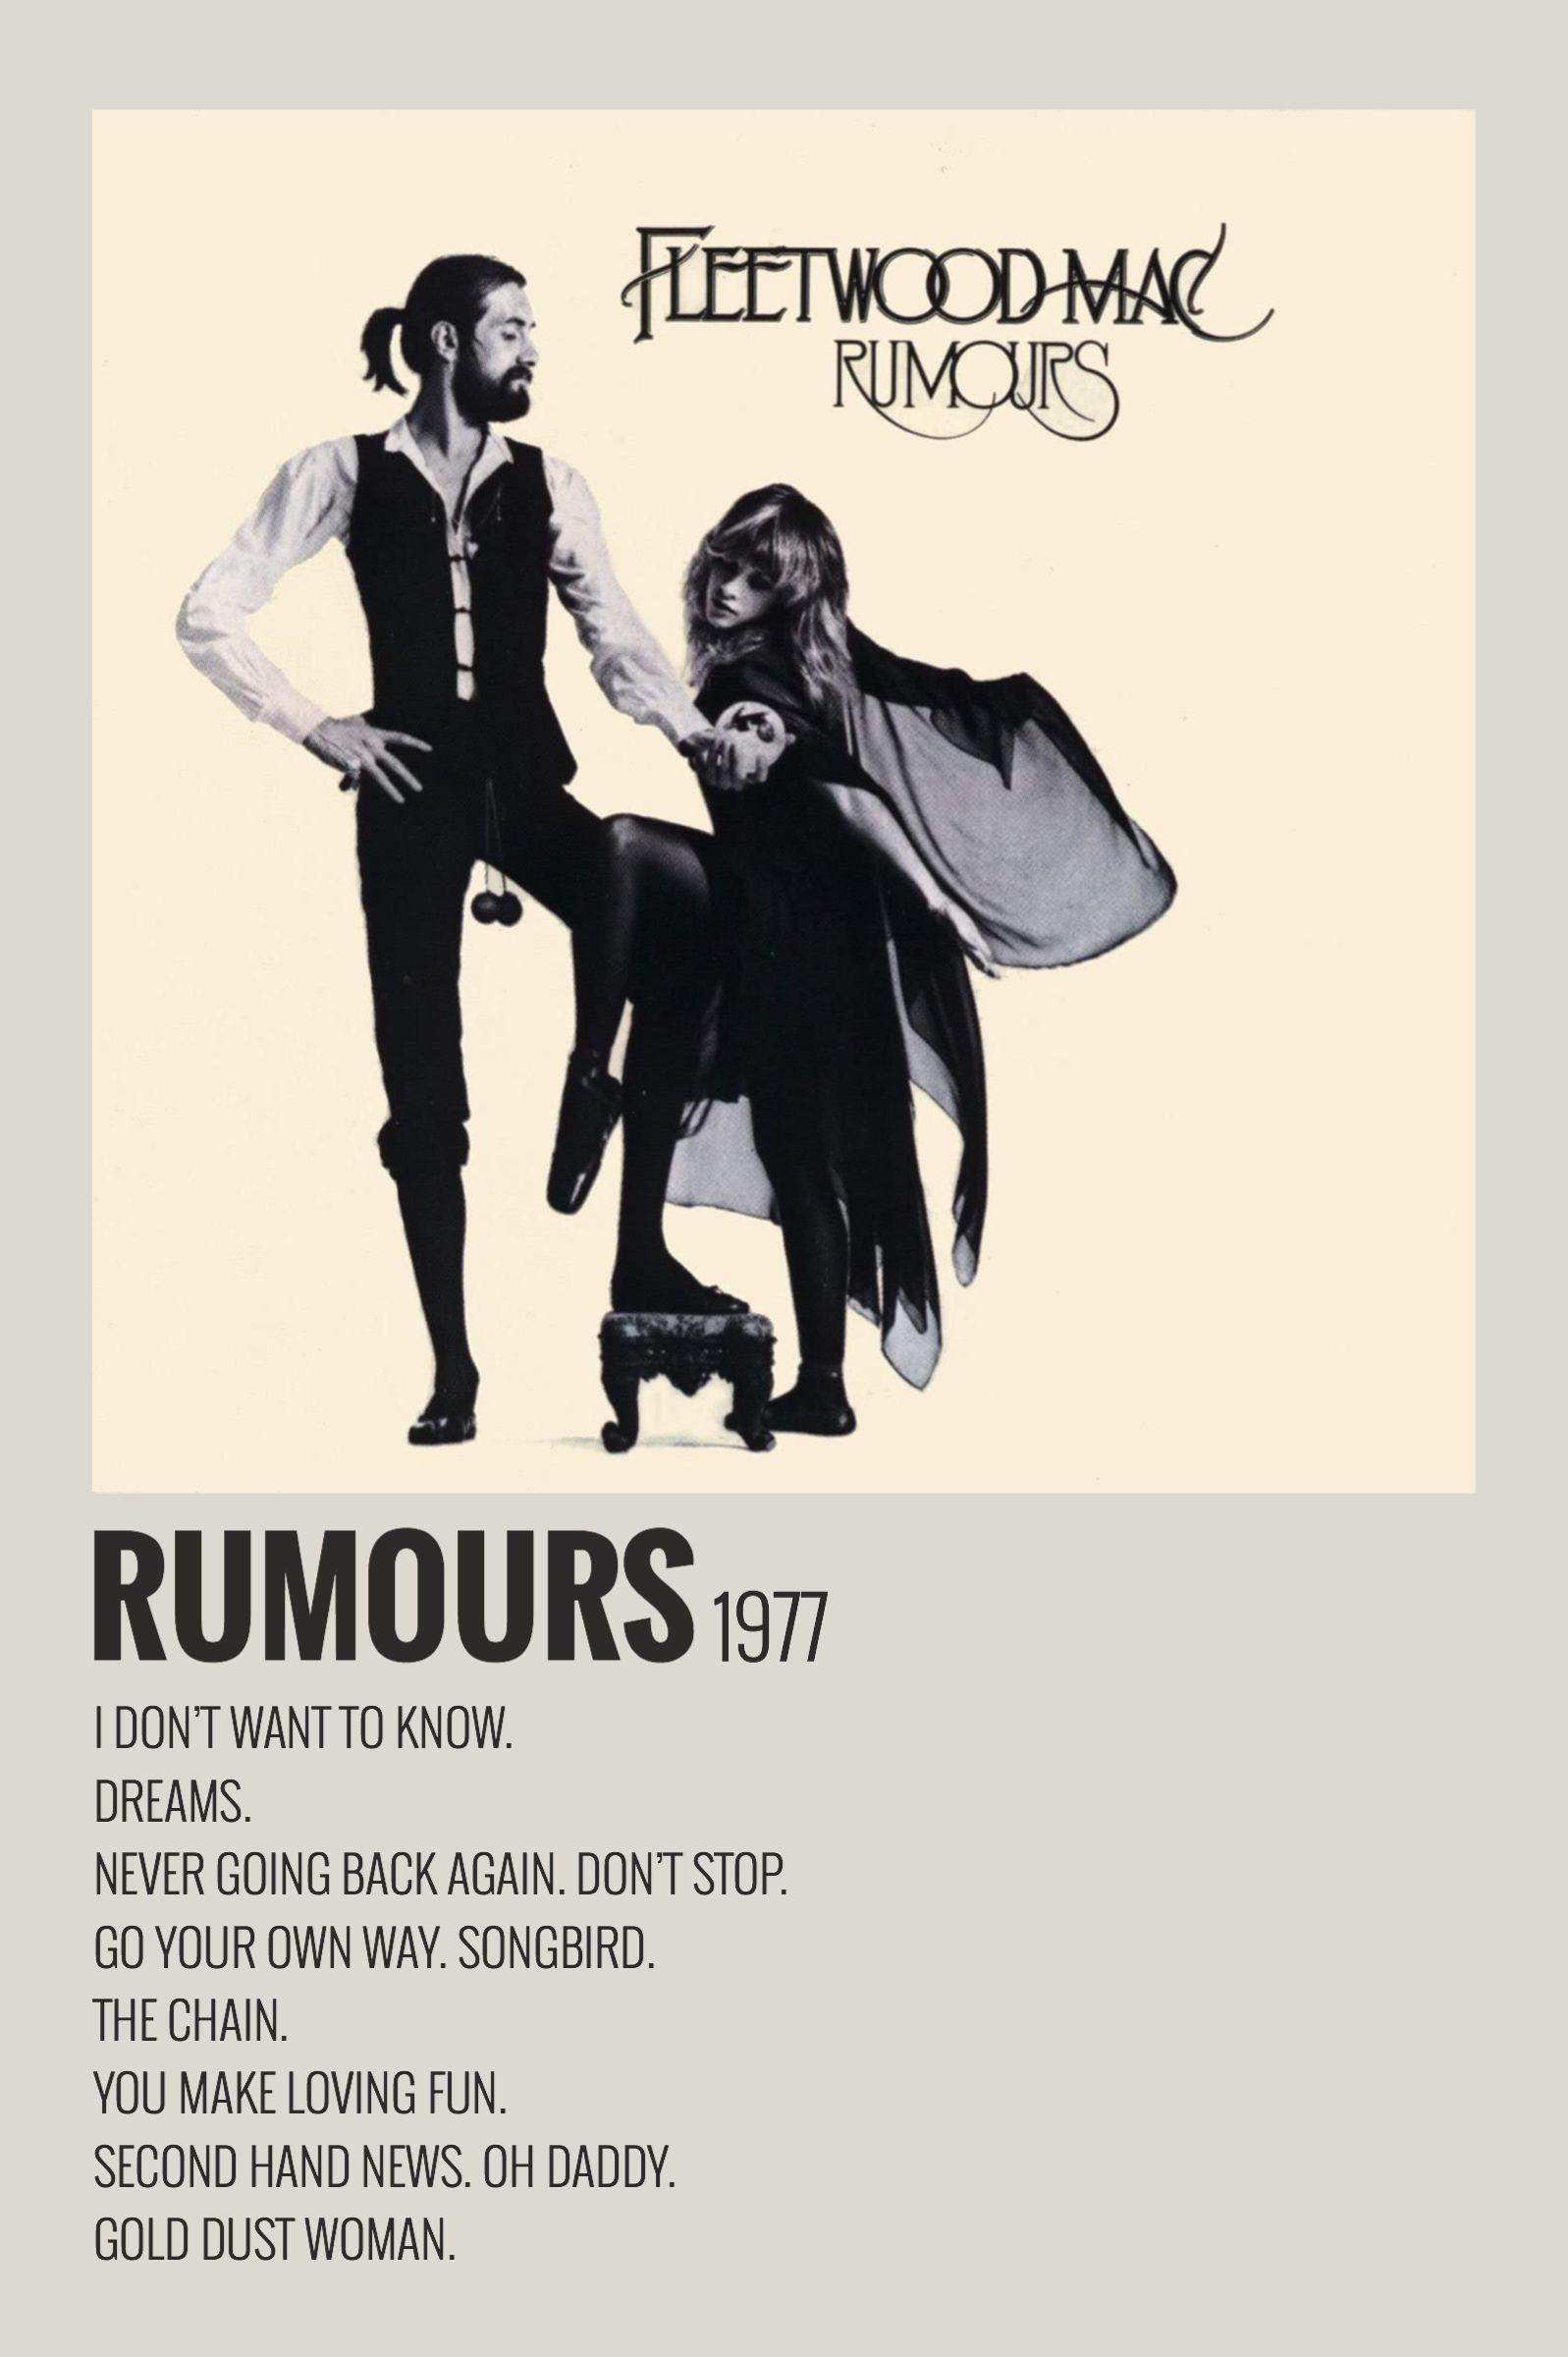 Alternative minimalist music album polaroid poster